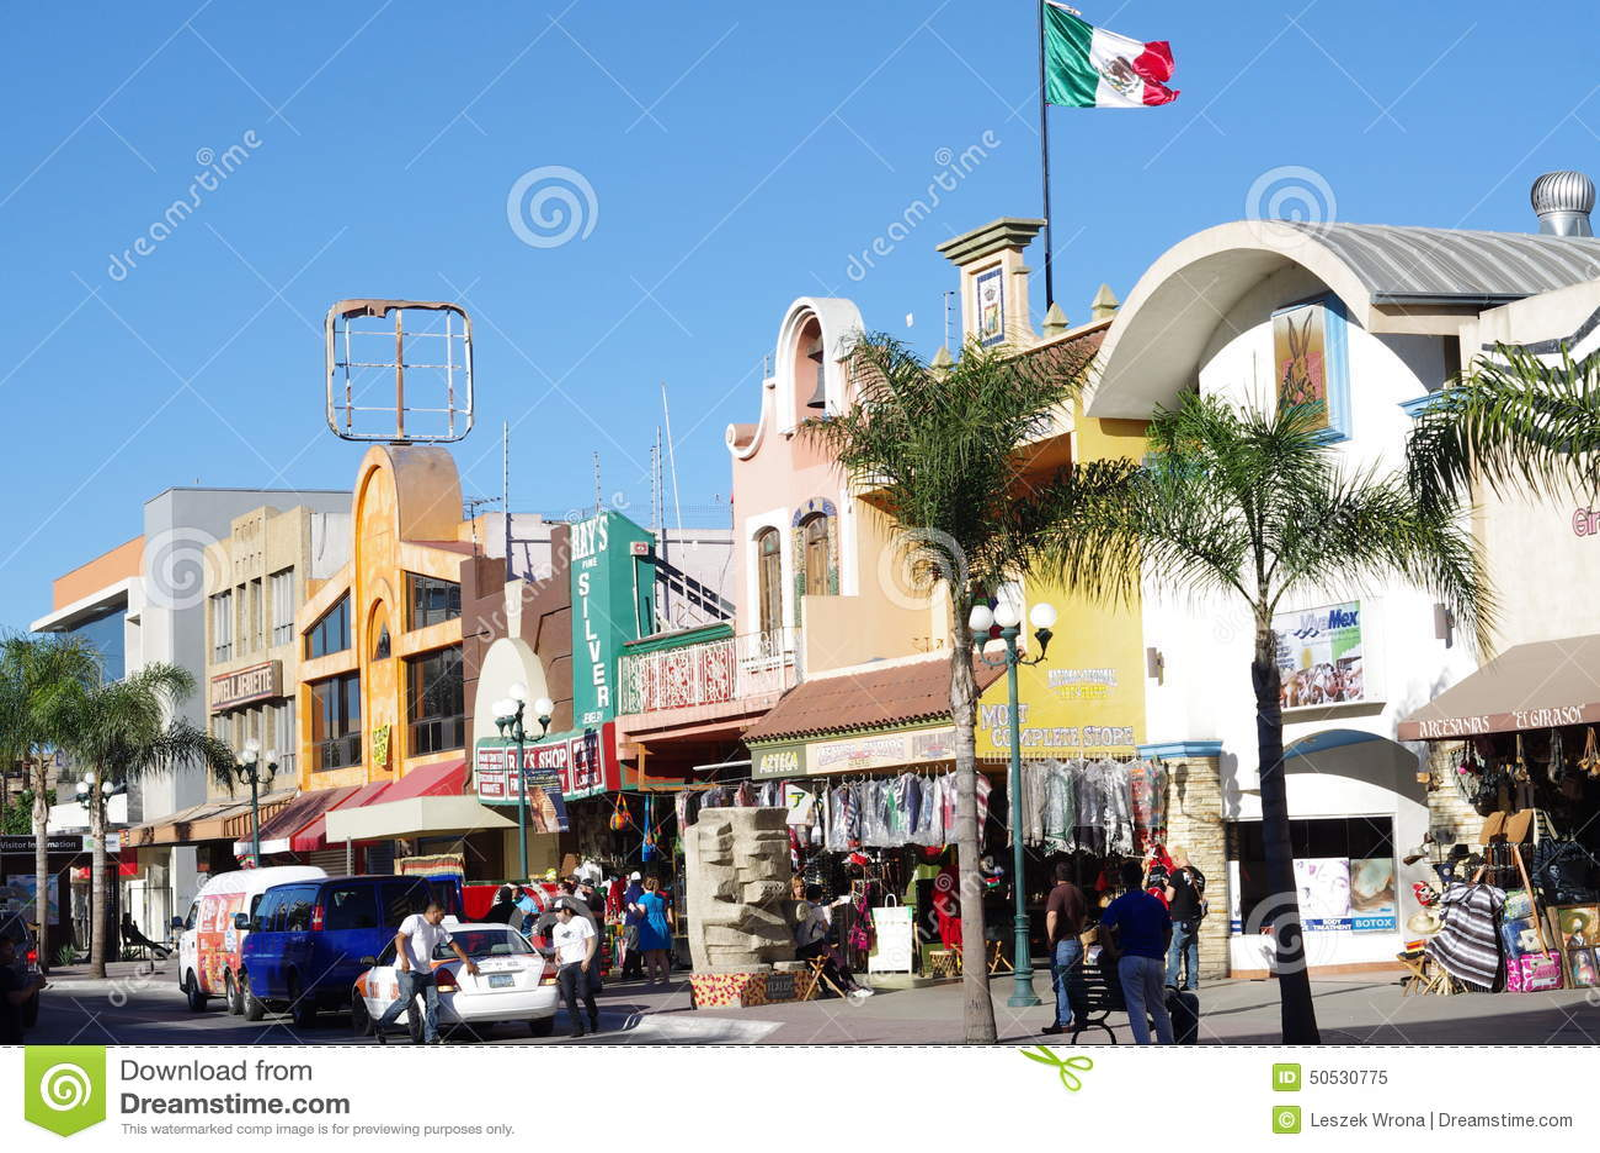 Dating sites in tijuana mexico